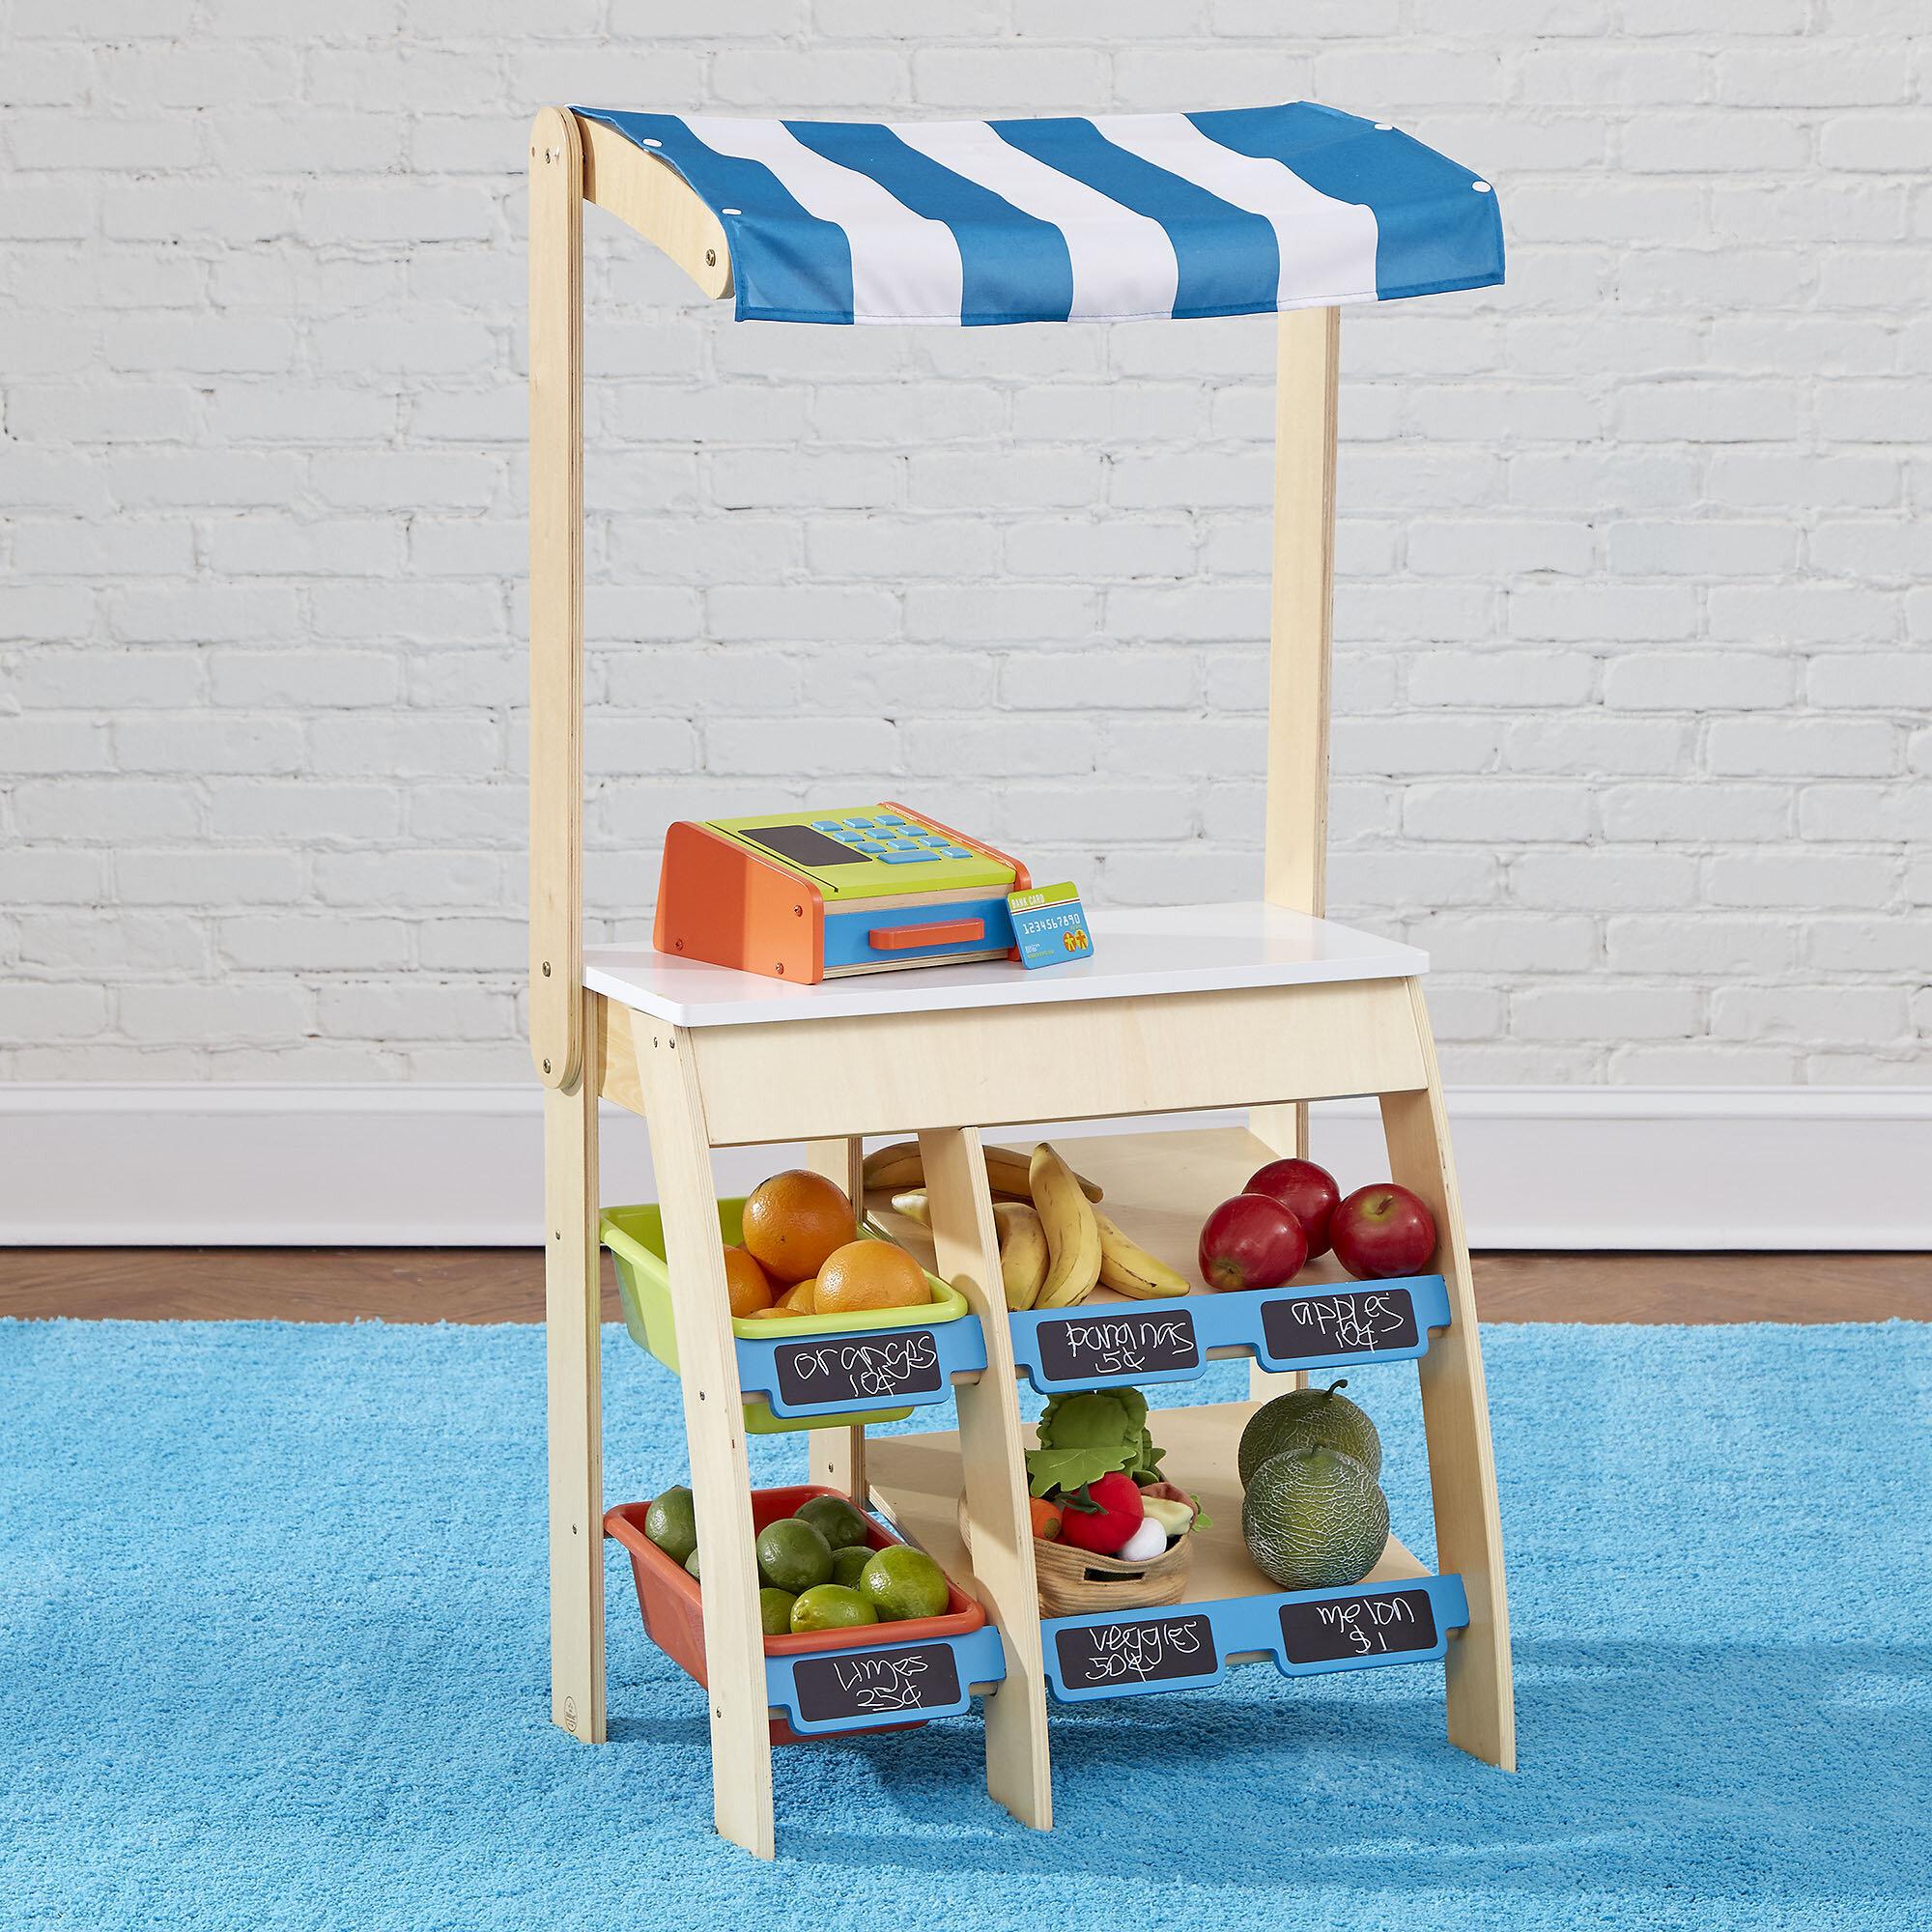 Kitchen Sets Play Kitchen Sets & Accessories You\'ll Love | Wayfair